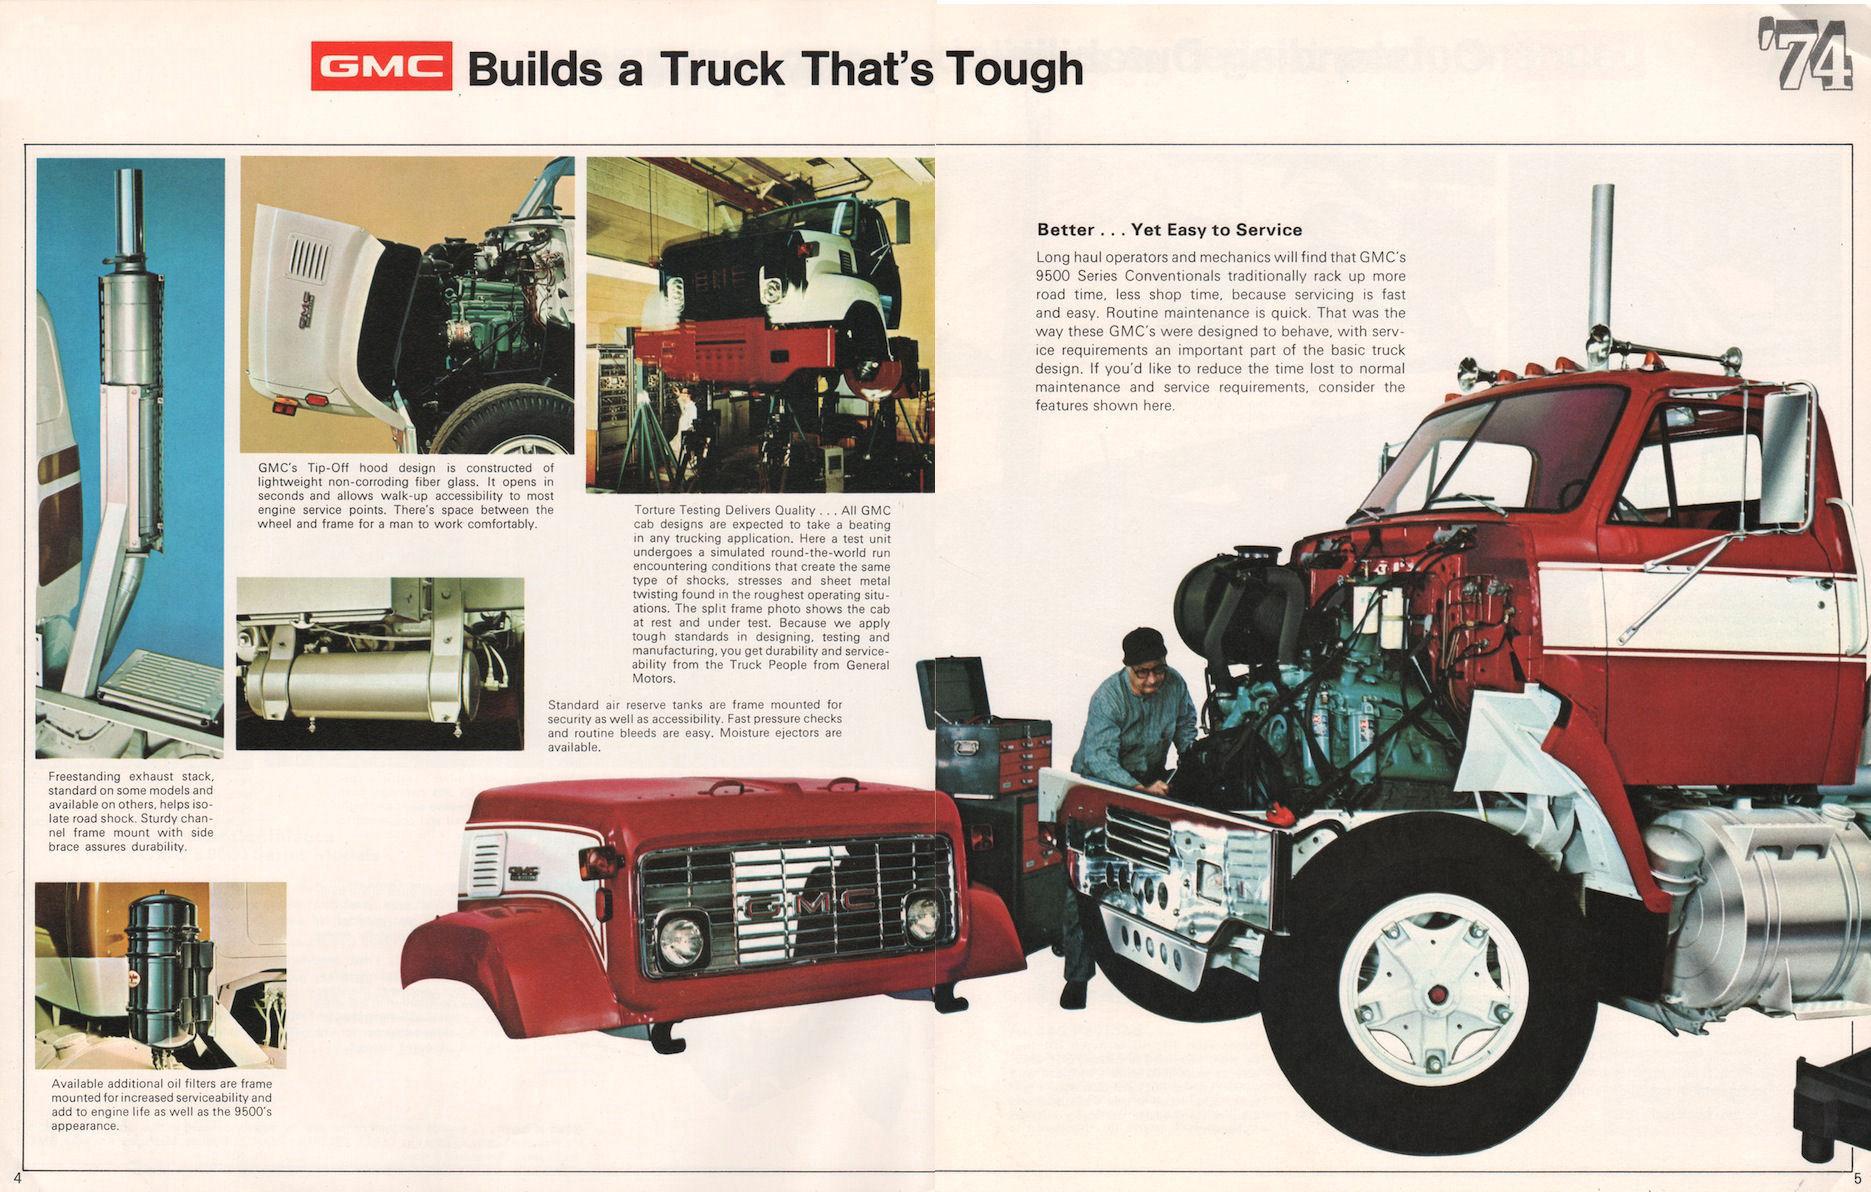 1974 Gmc 9500 Truck Brochure